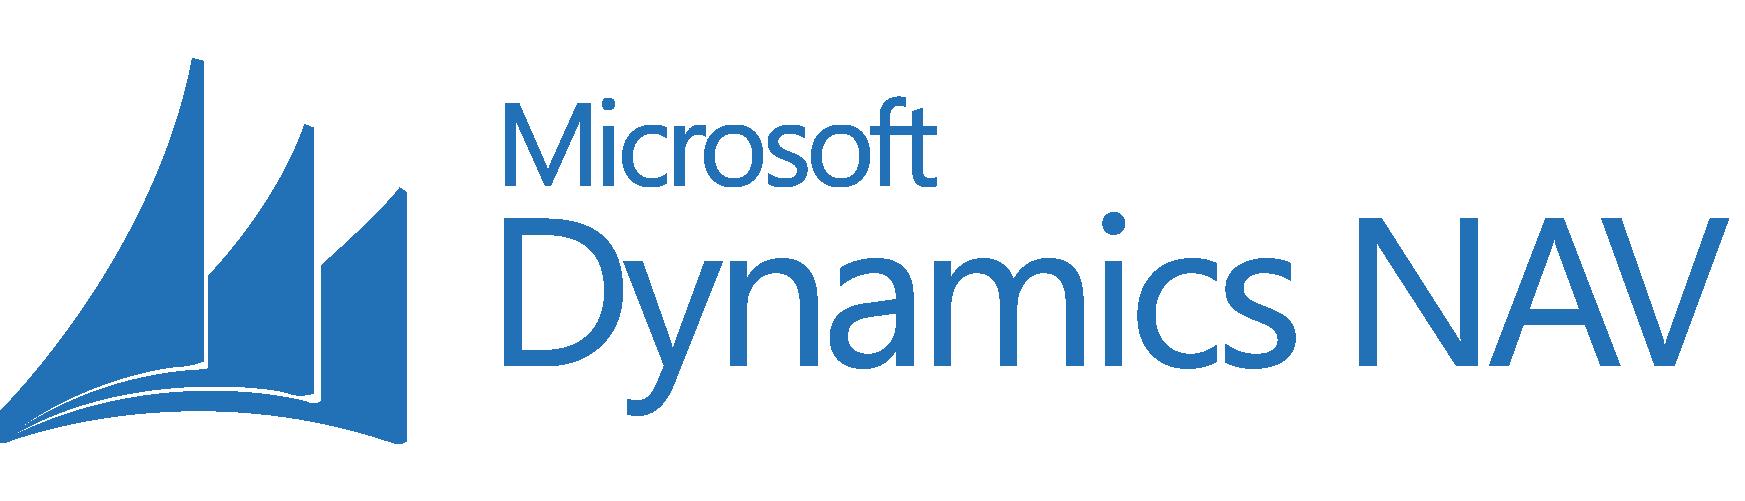 dynamics-nav-nbdynamics